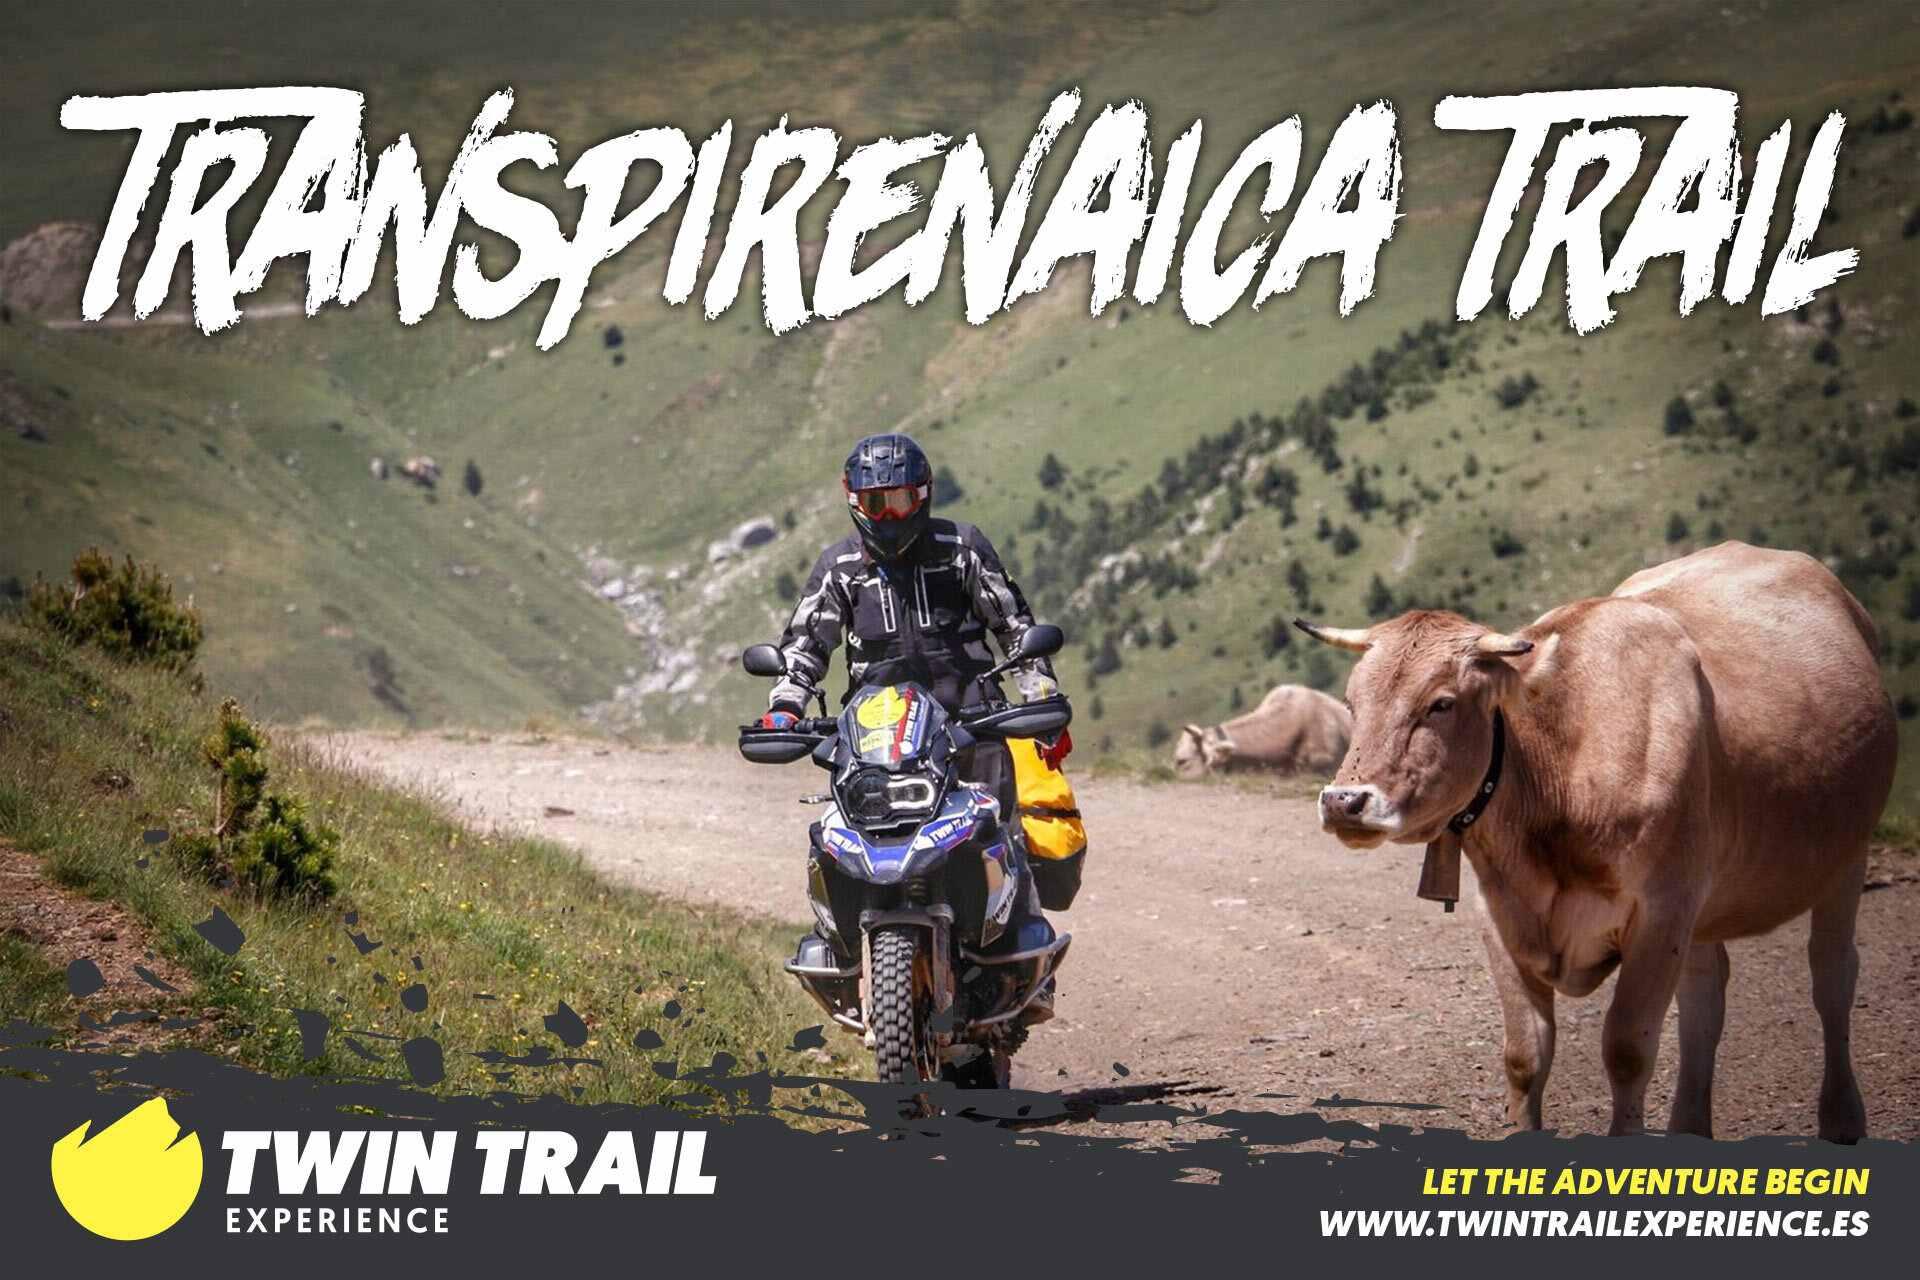 Transpirenaica Trail